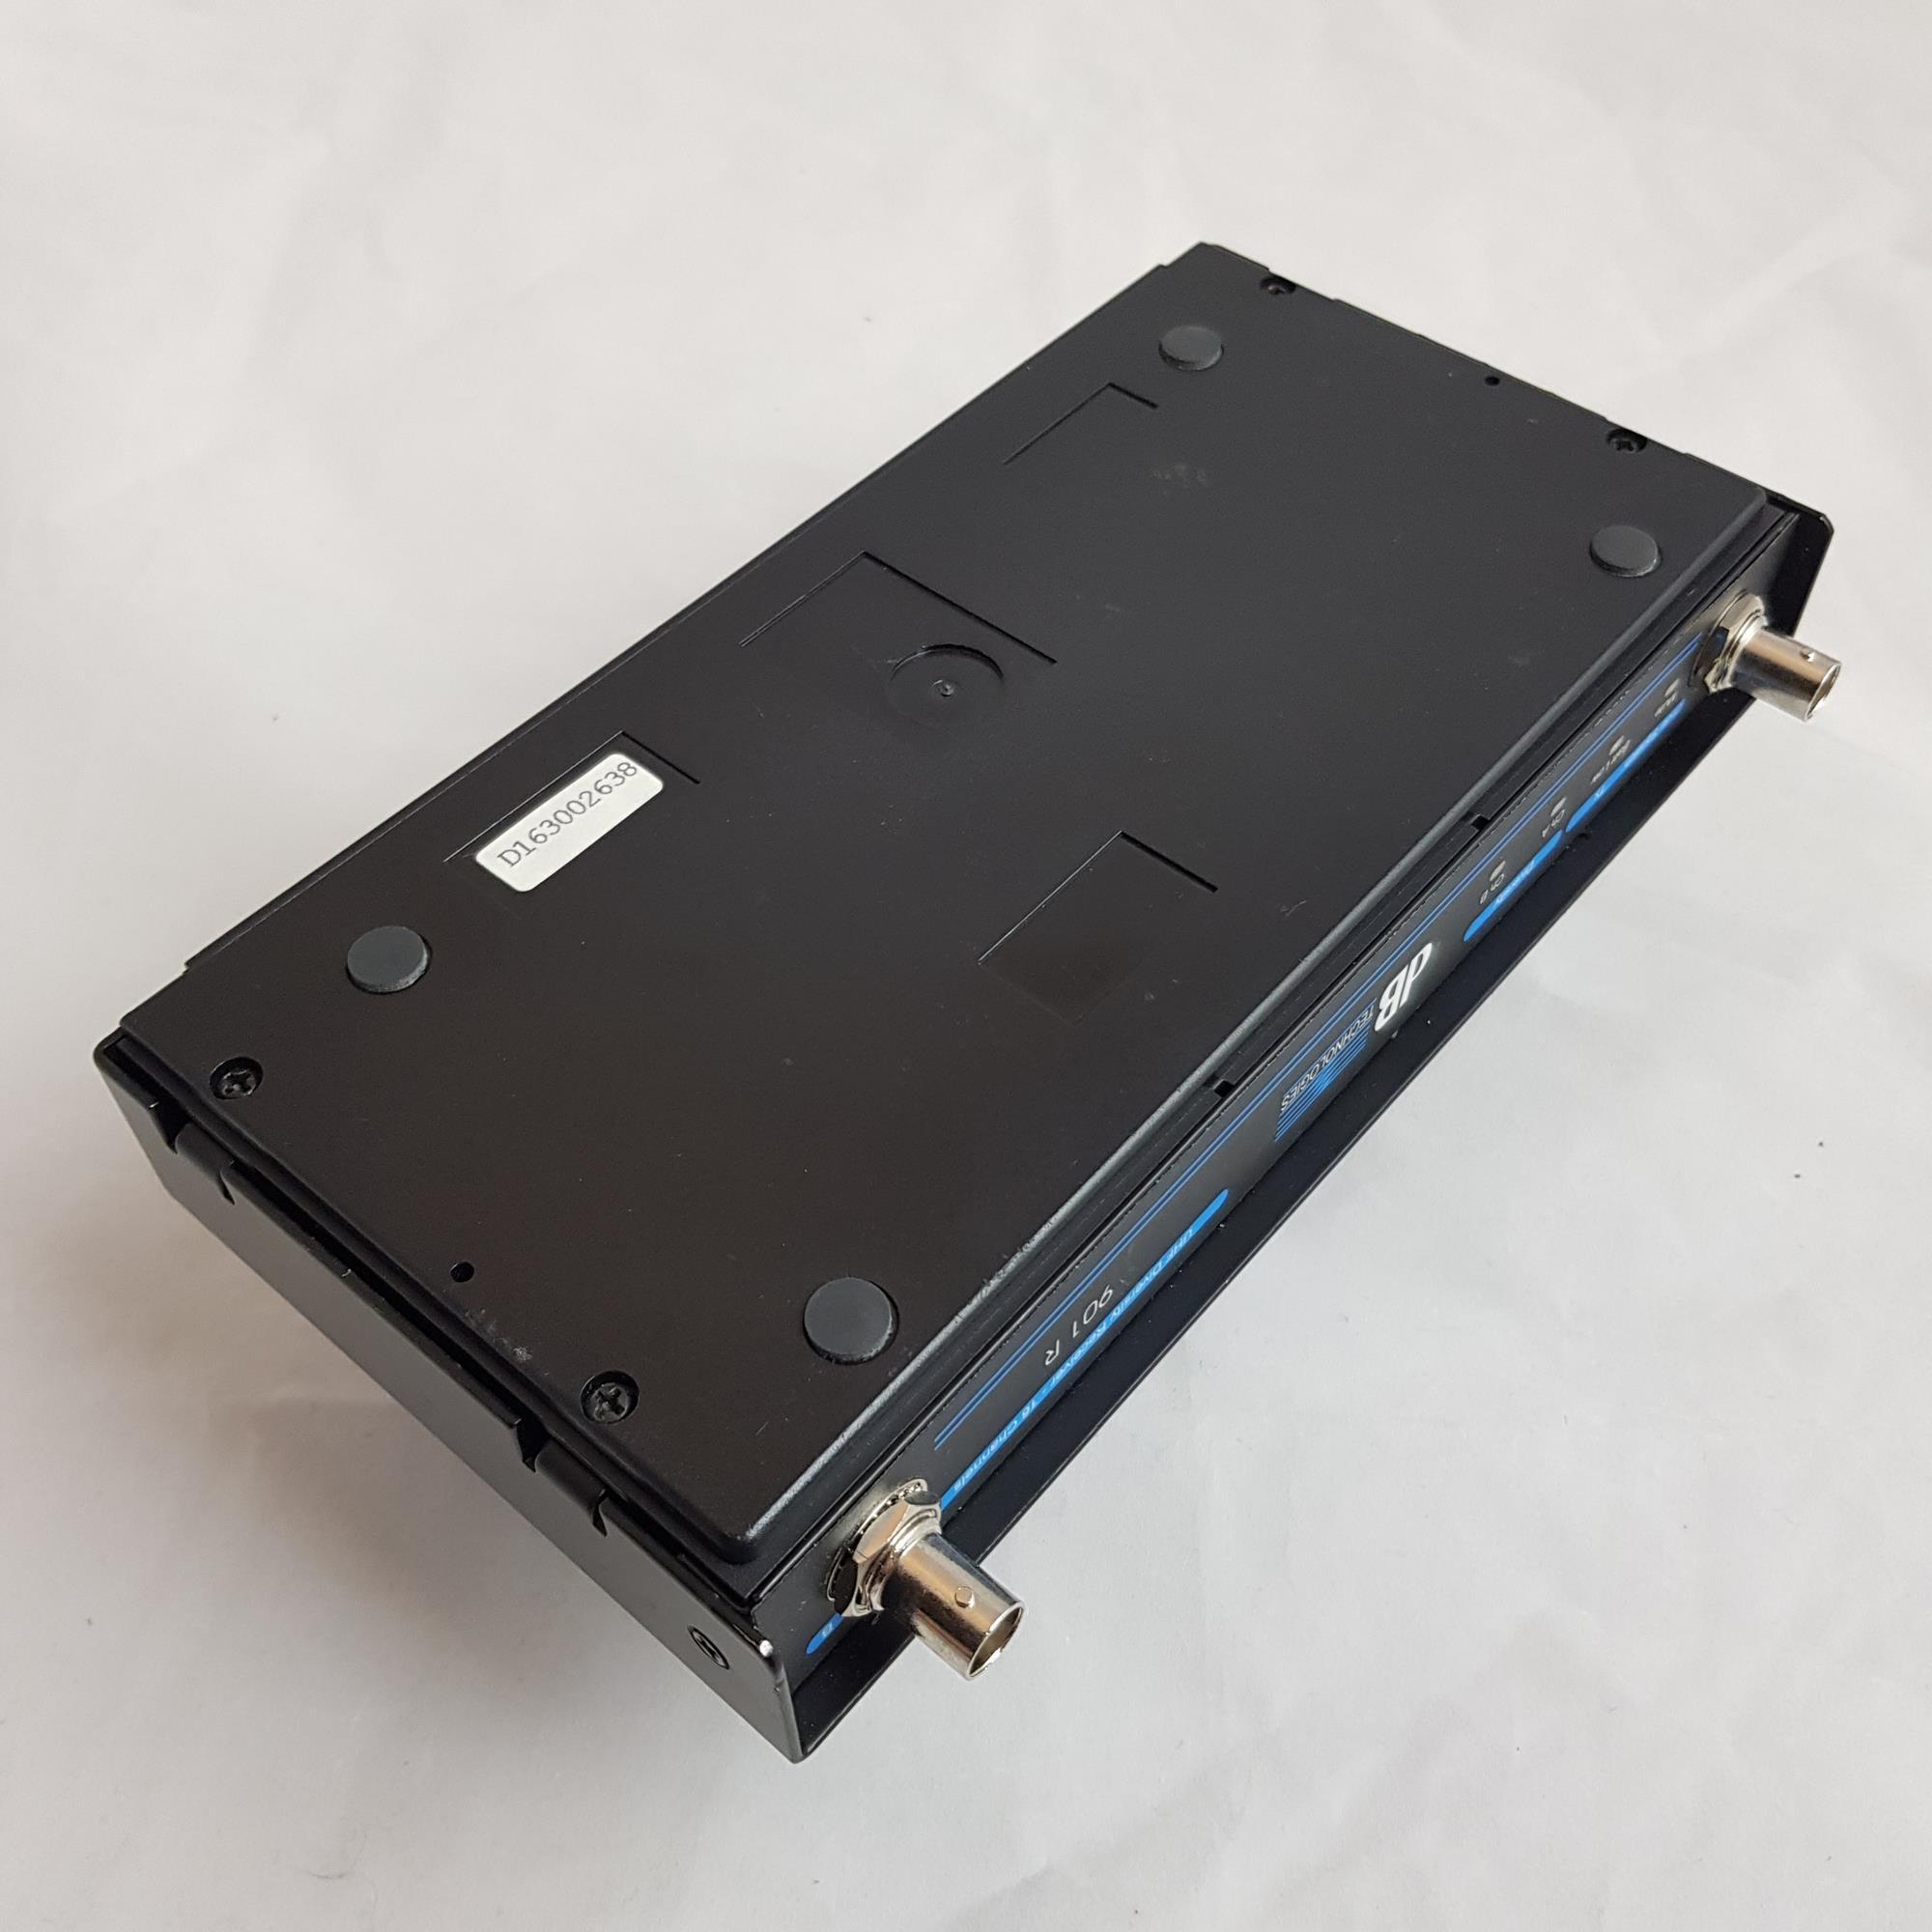 DB TECHNOLOGIES PU901 RADIO GELATO